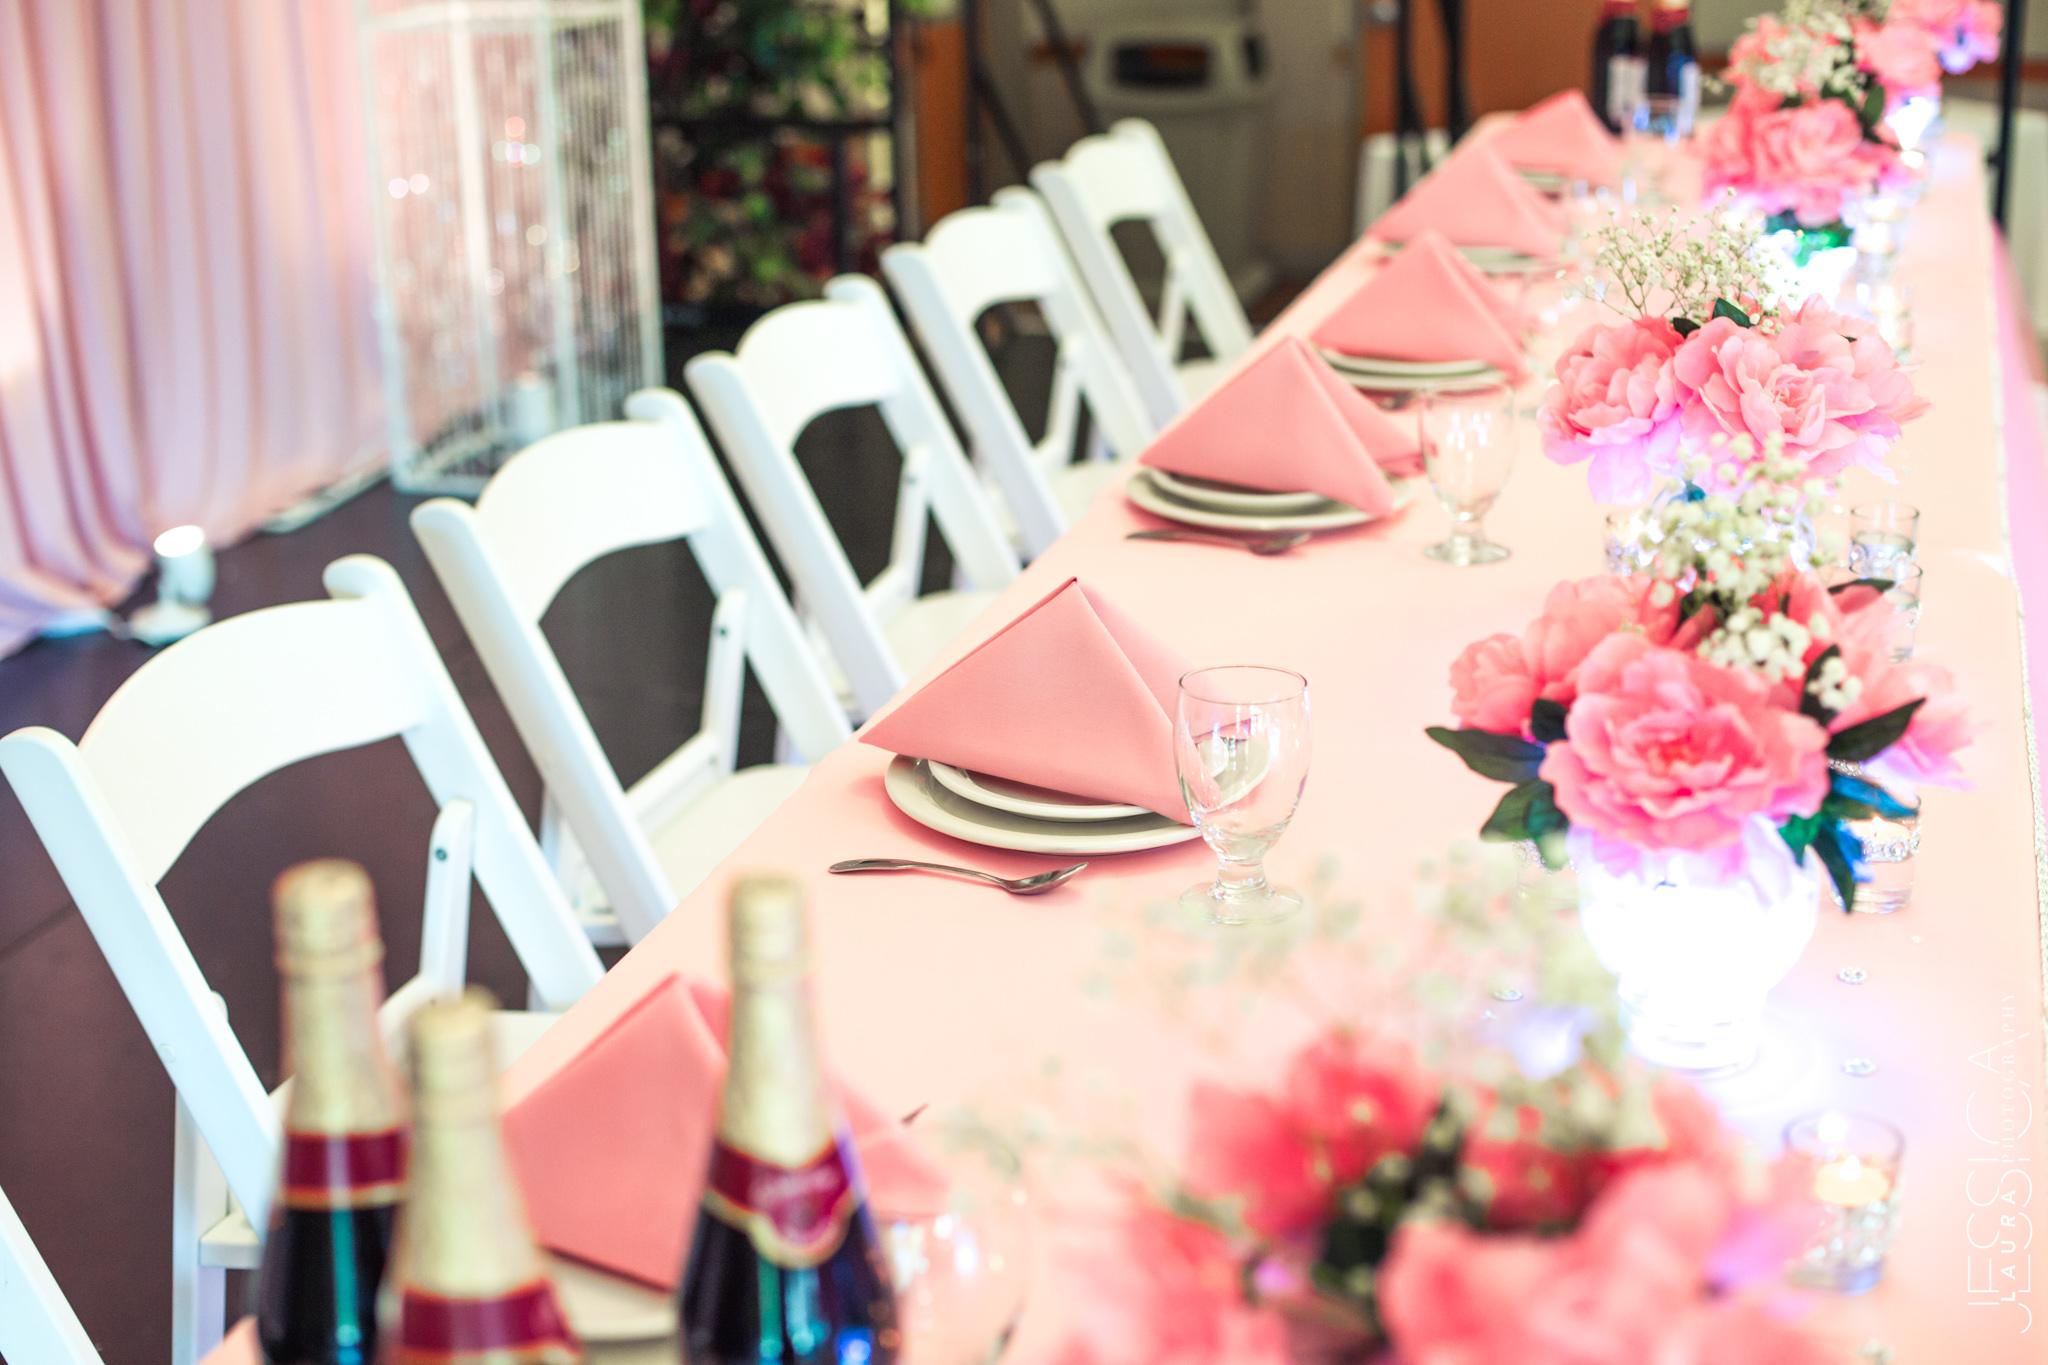 Eugene-Maryana_wedding_08062017_web (265 of 558).JPG